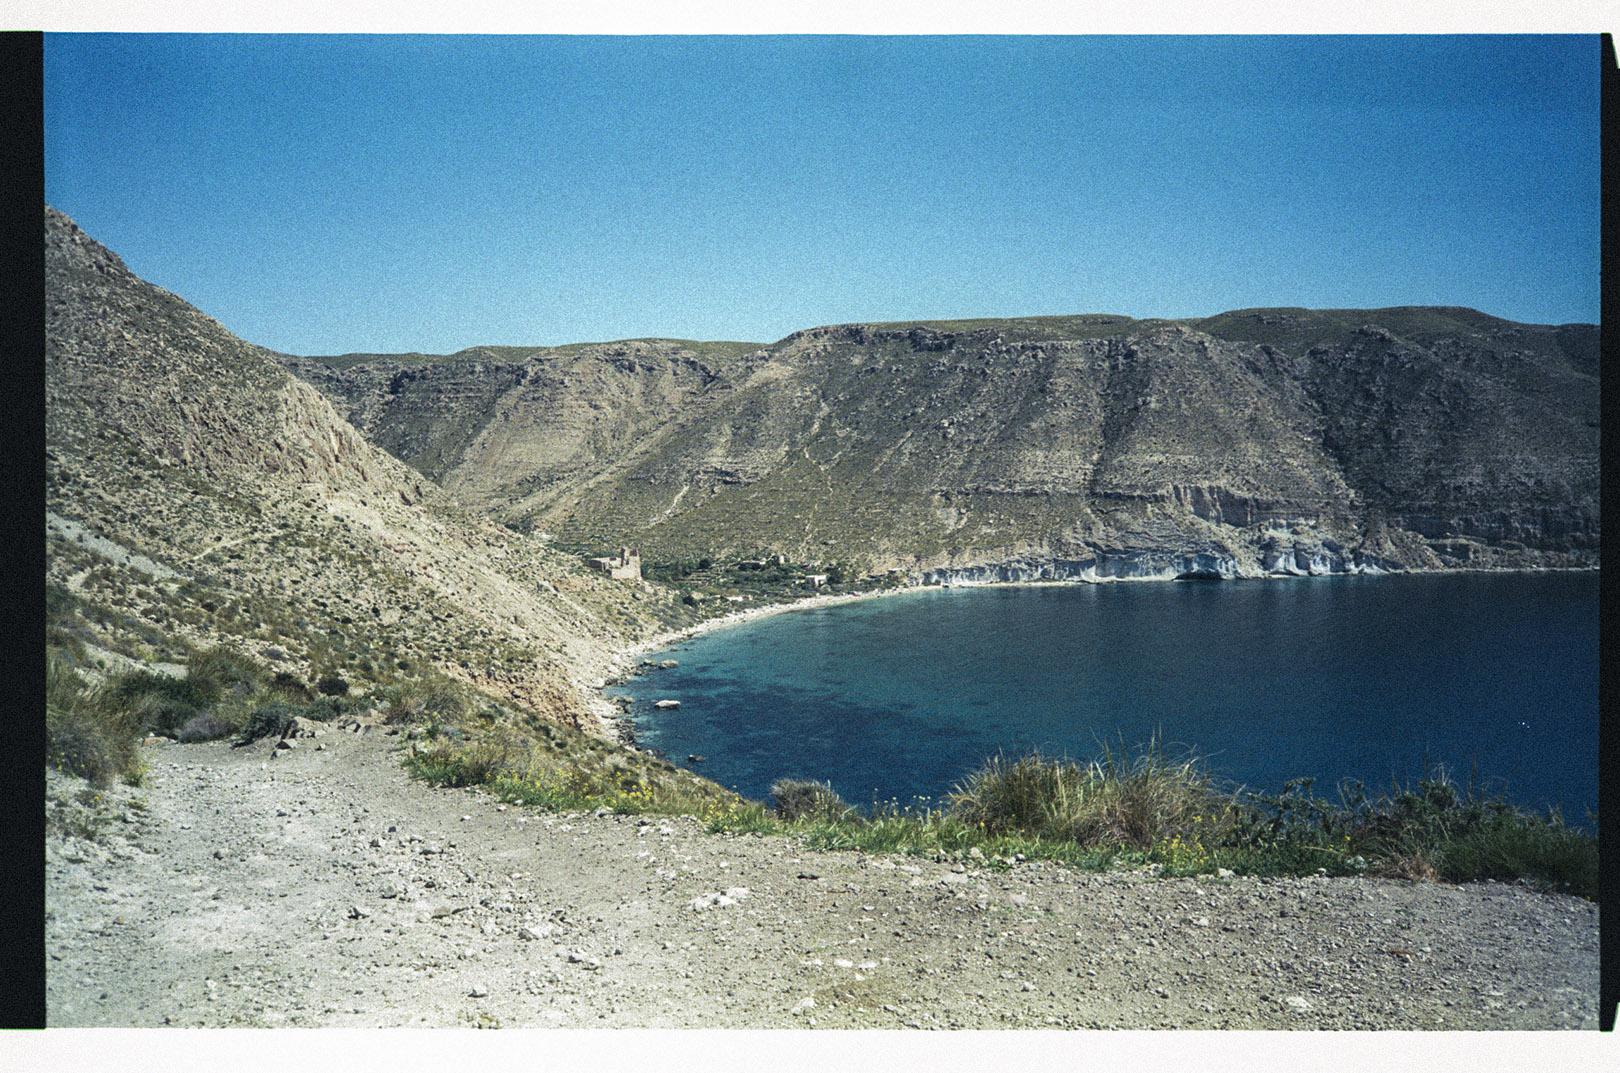 Cabo de Gata by Mirta Rojo